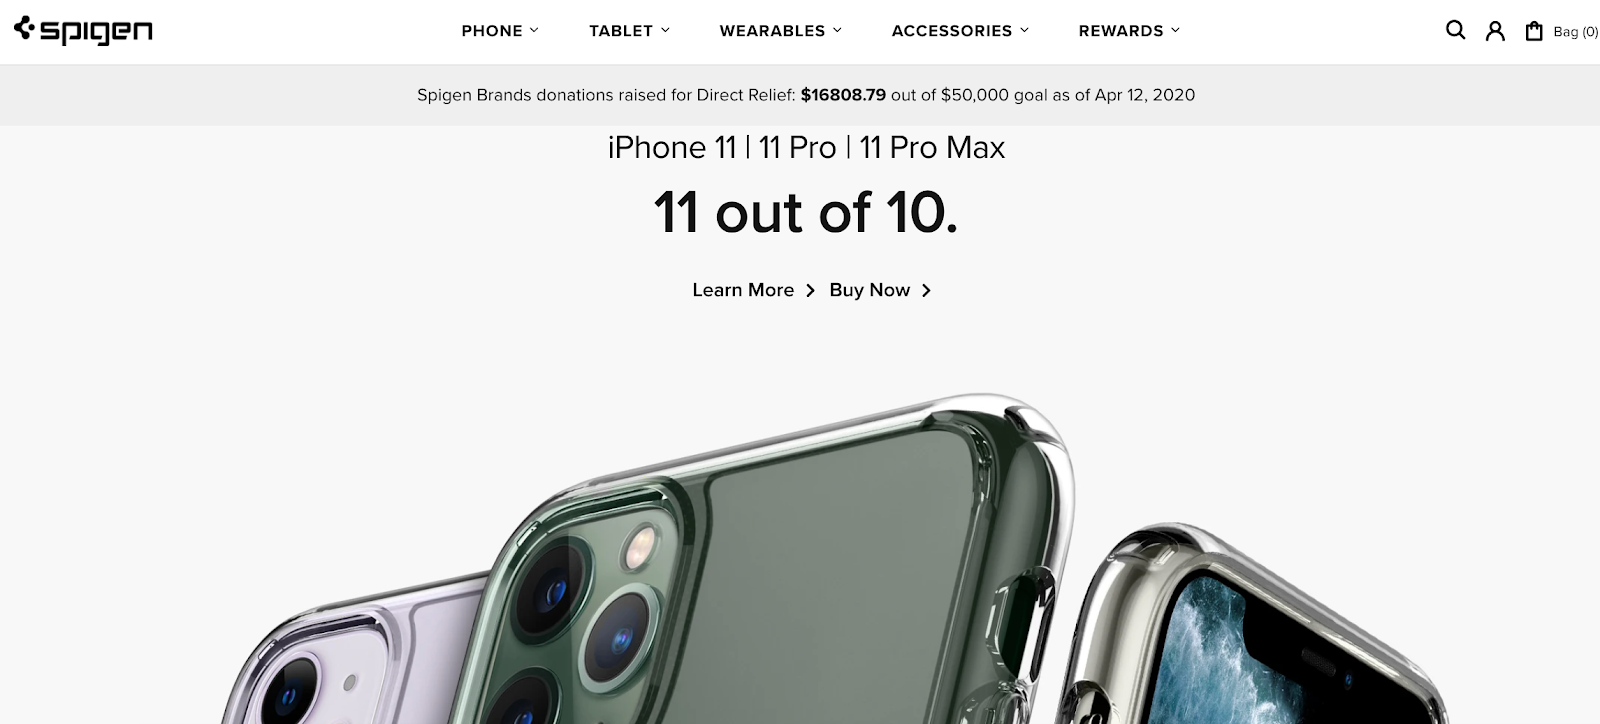 Spigen homepage with three iPhones in the background